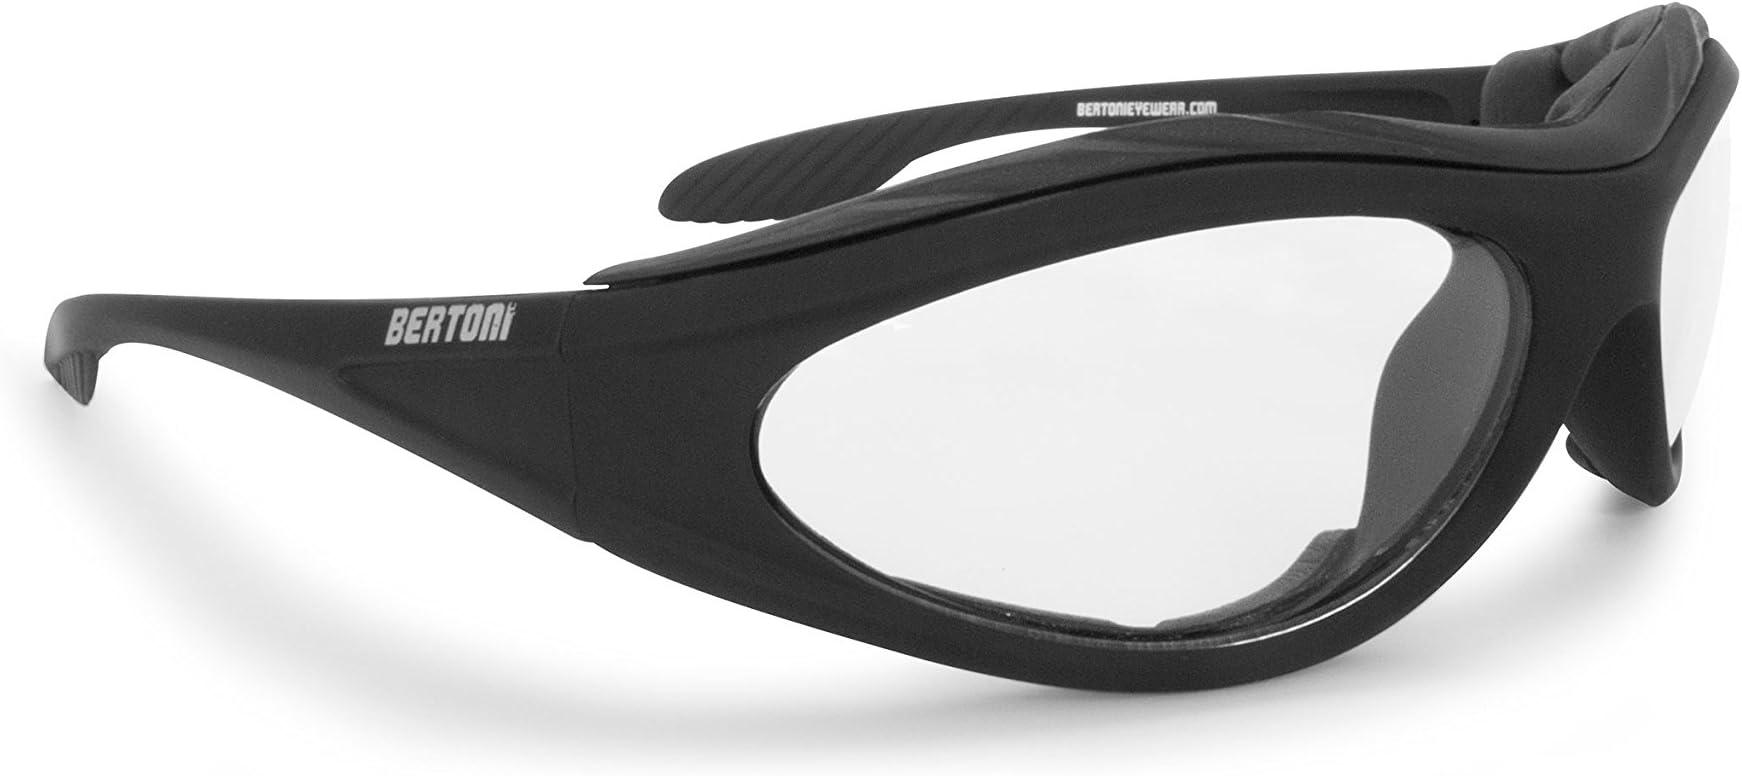 Bertoni Motorcycle Padded Glasses - Windproof Antifog Anticrash Lens - AF125B Italy - Motorbyke Riding Sunglasses - Matt Black - Clear Lens